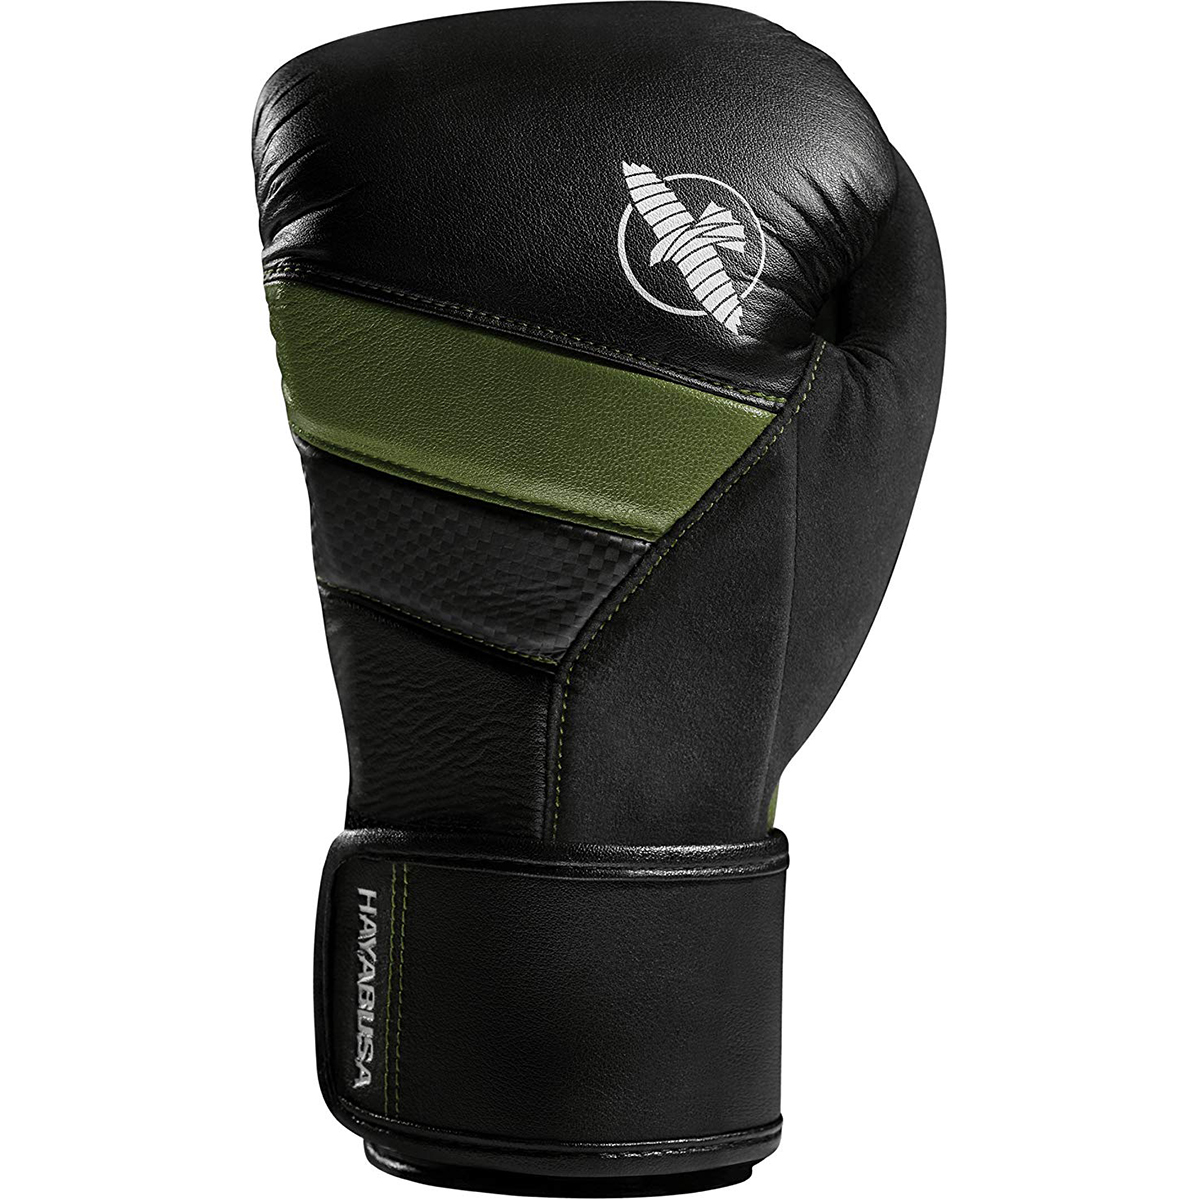 Hayabusa-T3-Dual-X-Hook-and-Loop-Closure-Vylar-Leather-Training-Boxing-Gloves thumbnail 11